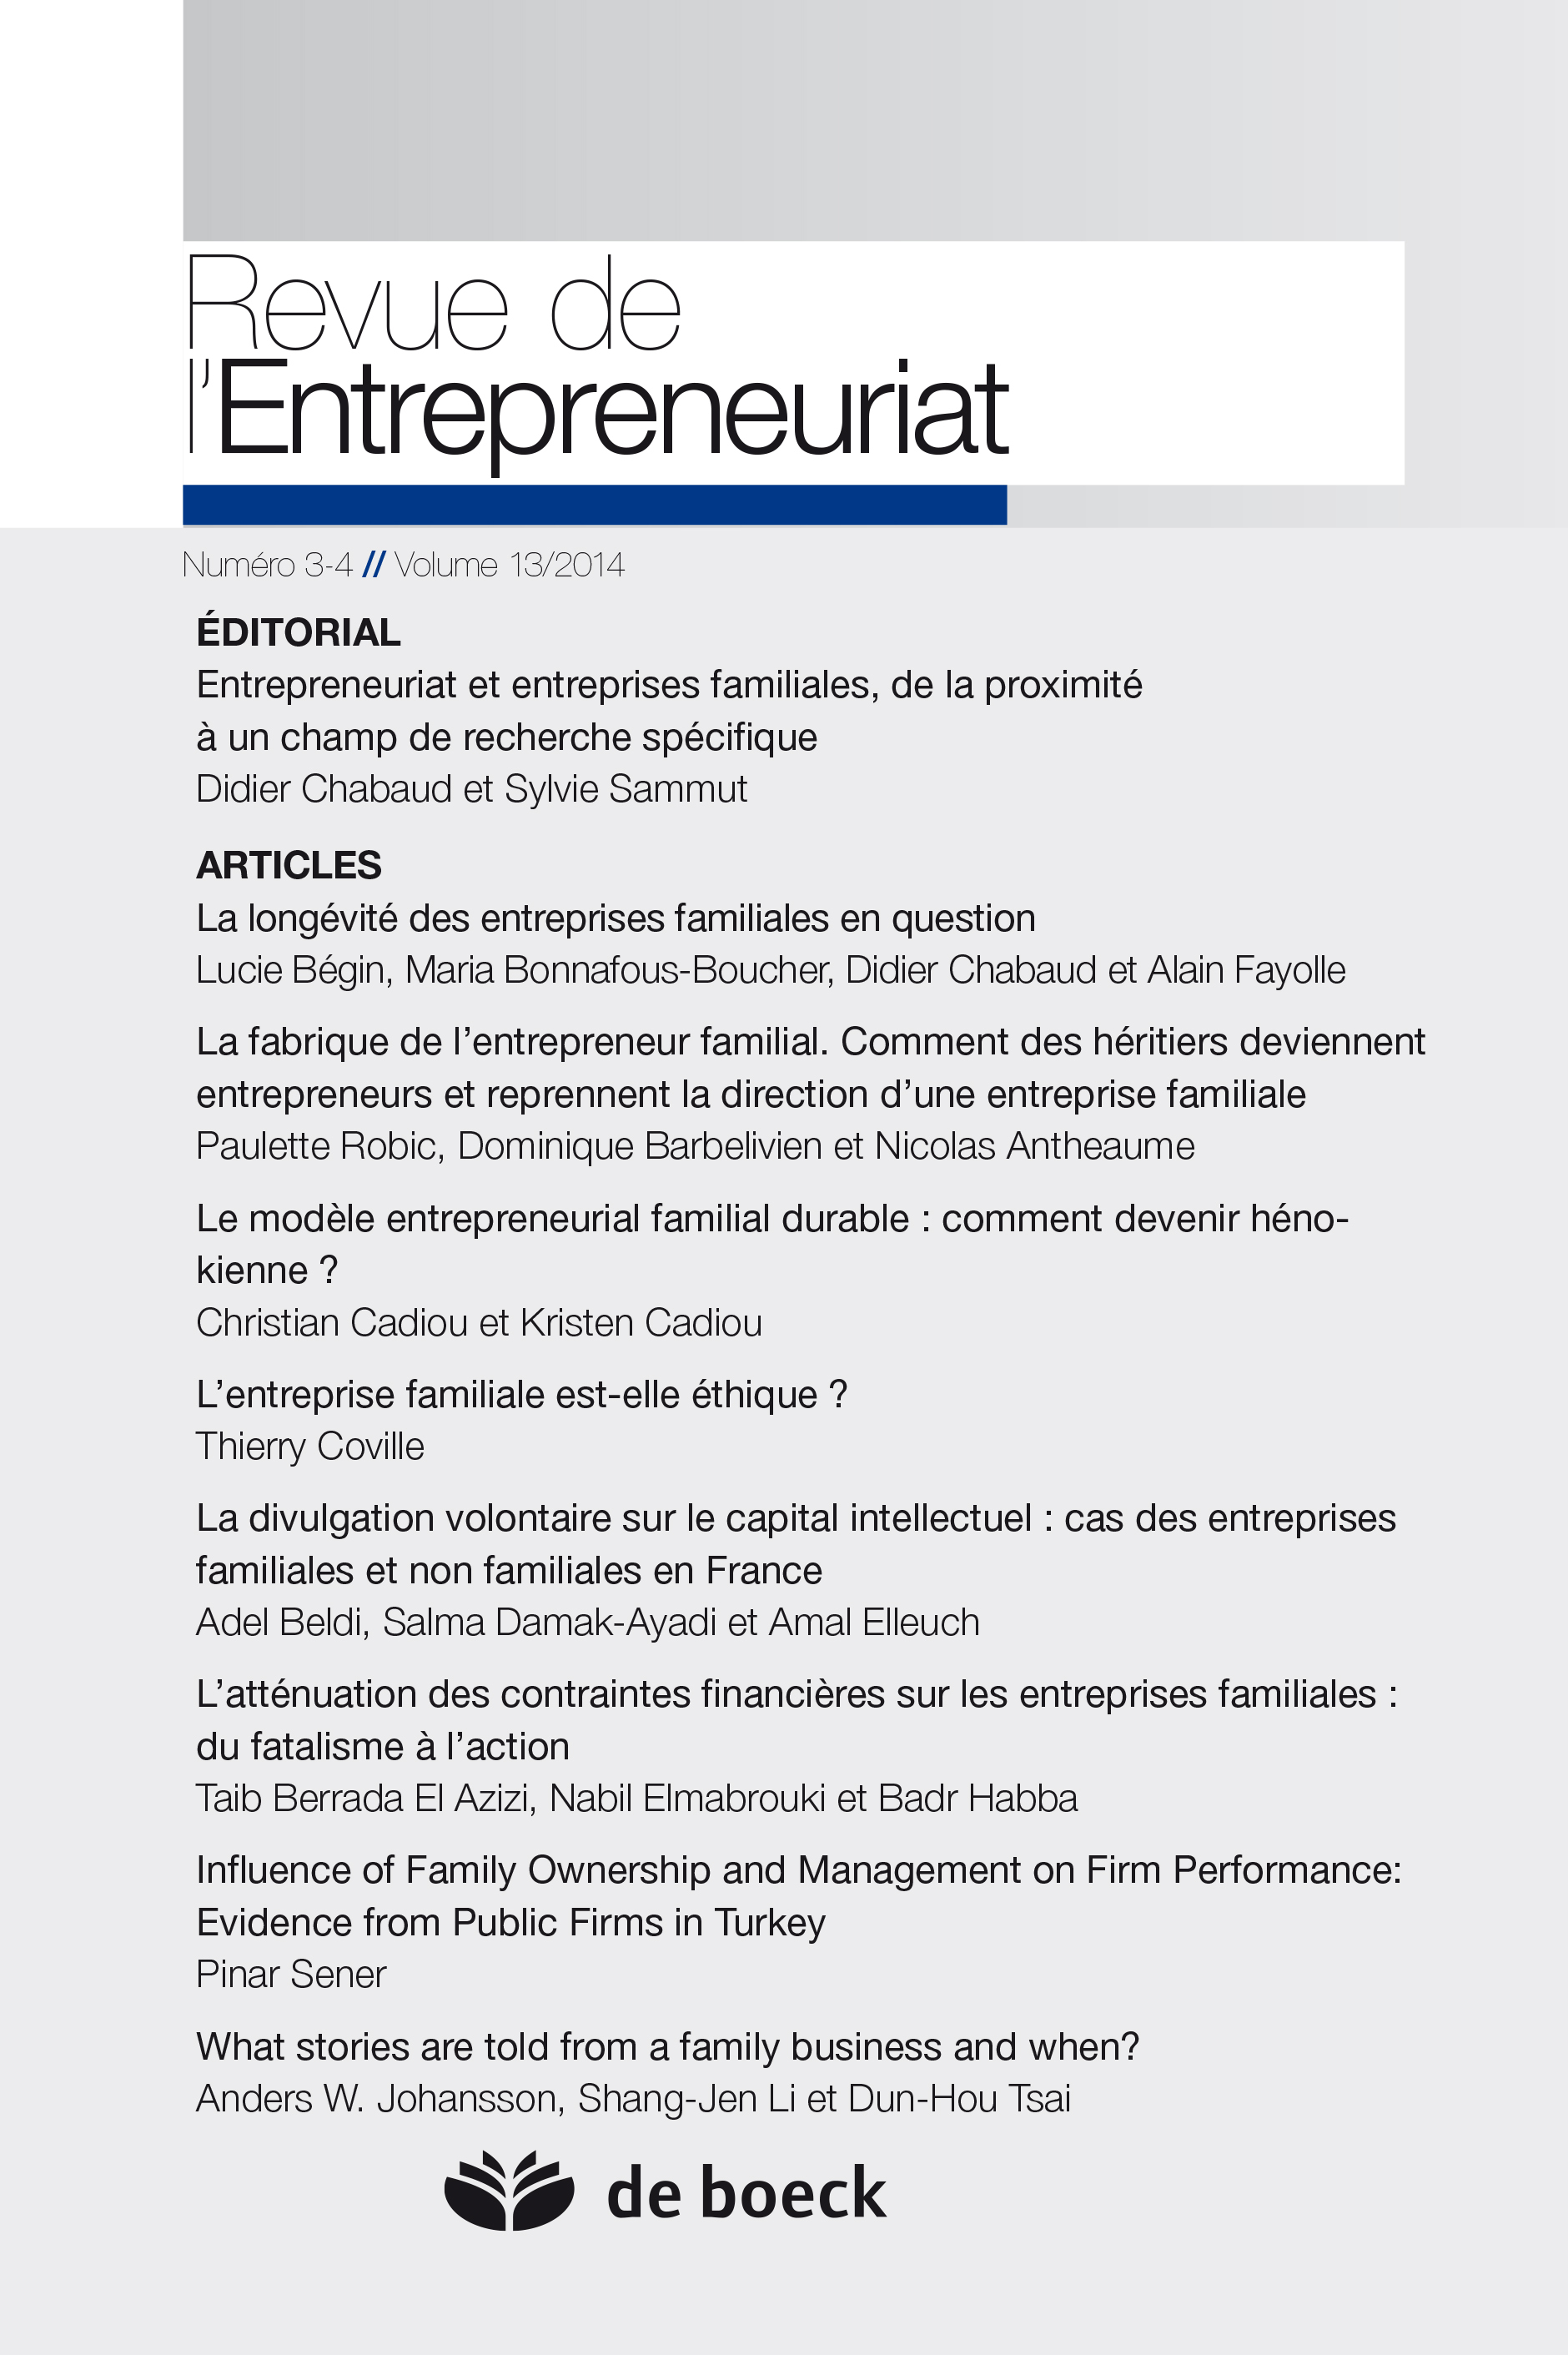 REVUE DE L'ENTREPRENEURIAT N.3-4 VOLUME 13/2014